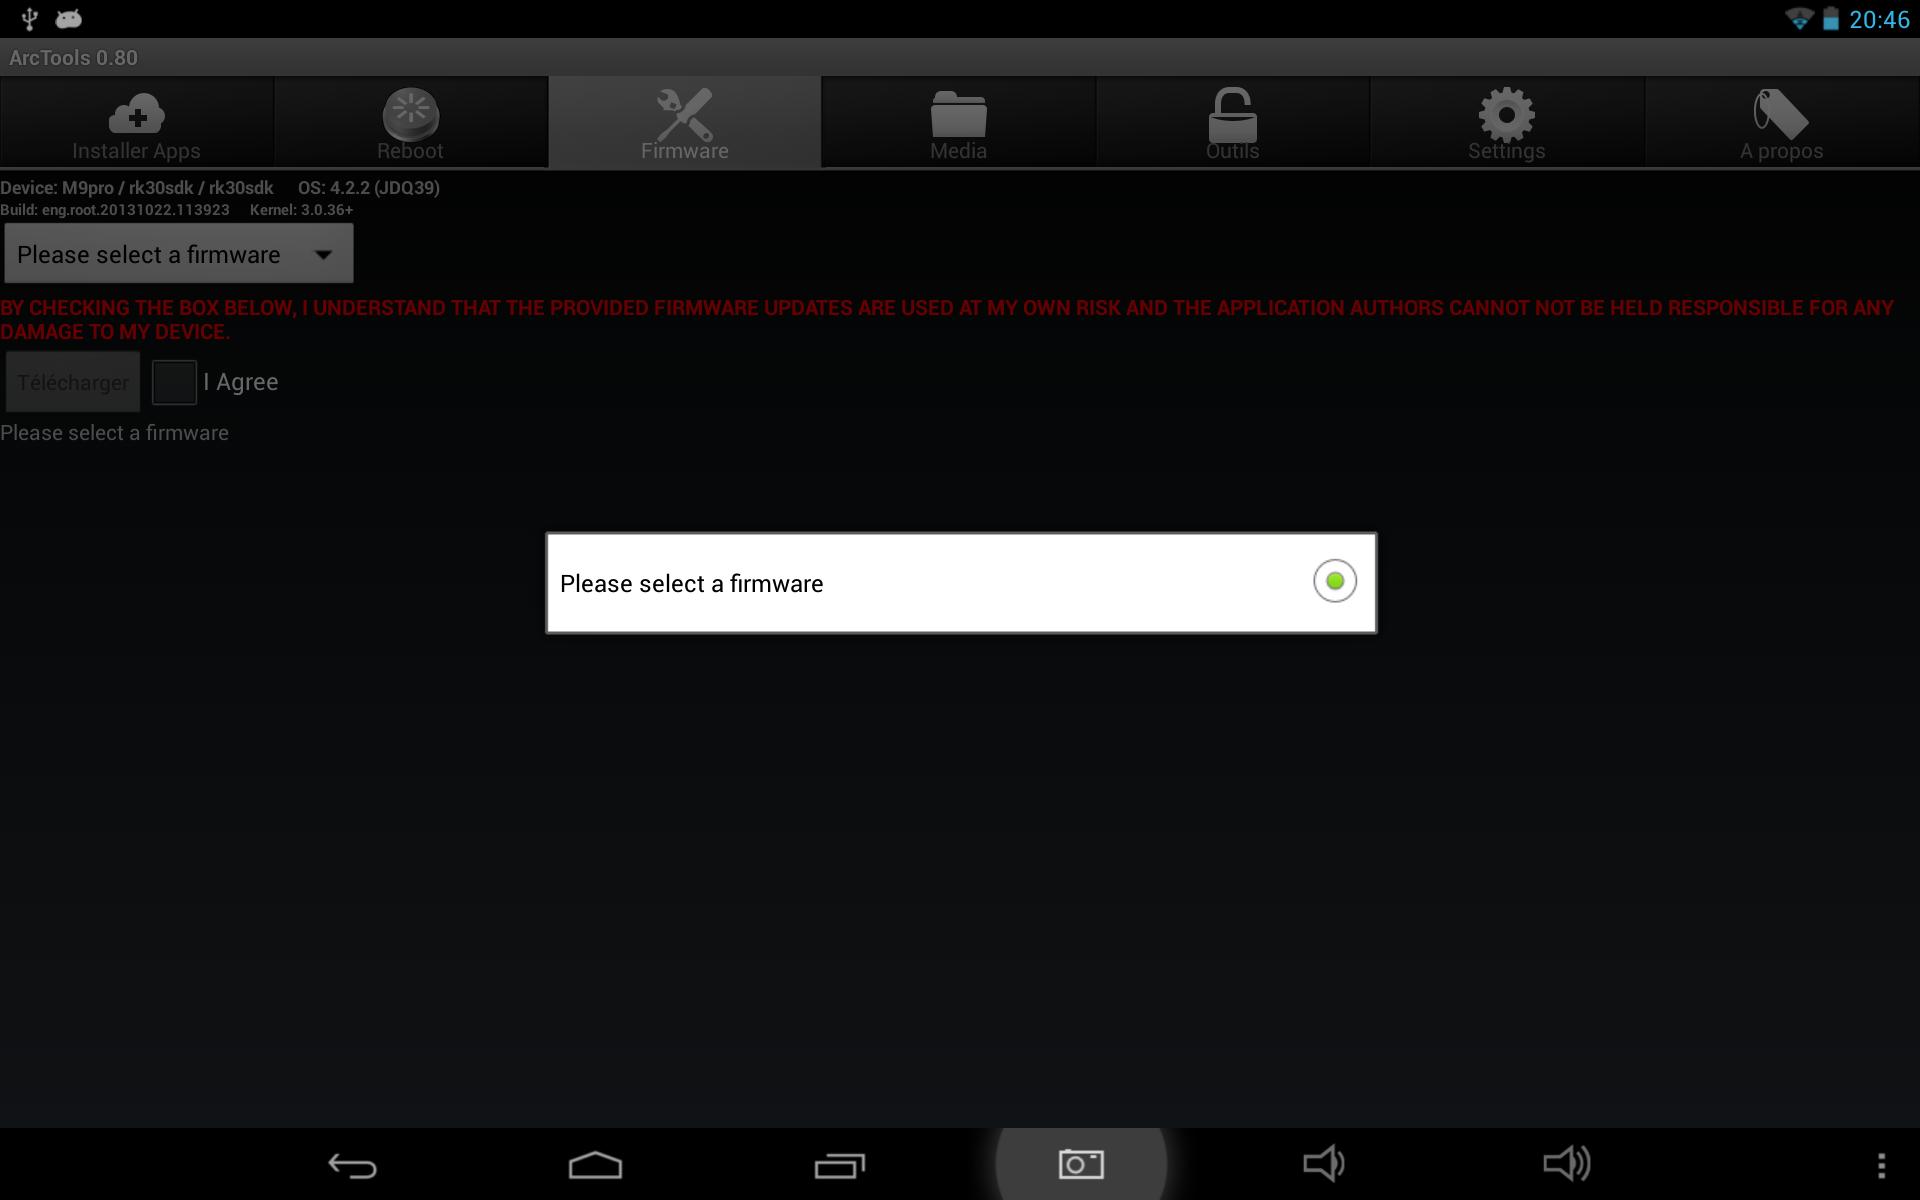 Screenshot_2013-10-25-20-46-07-1.png